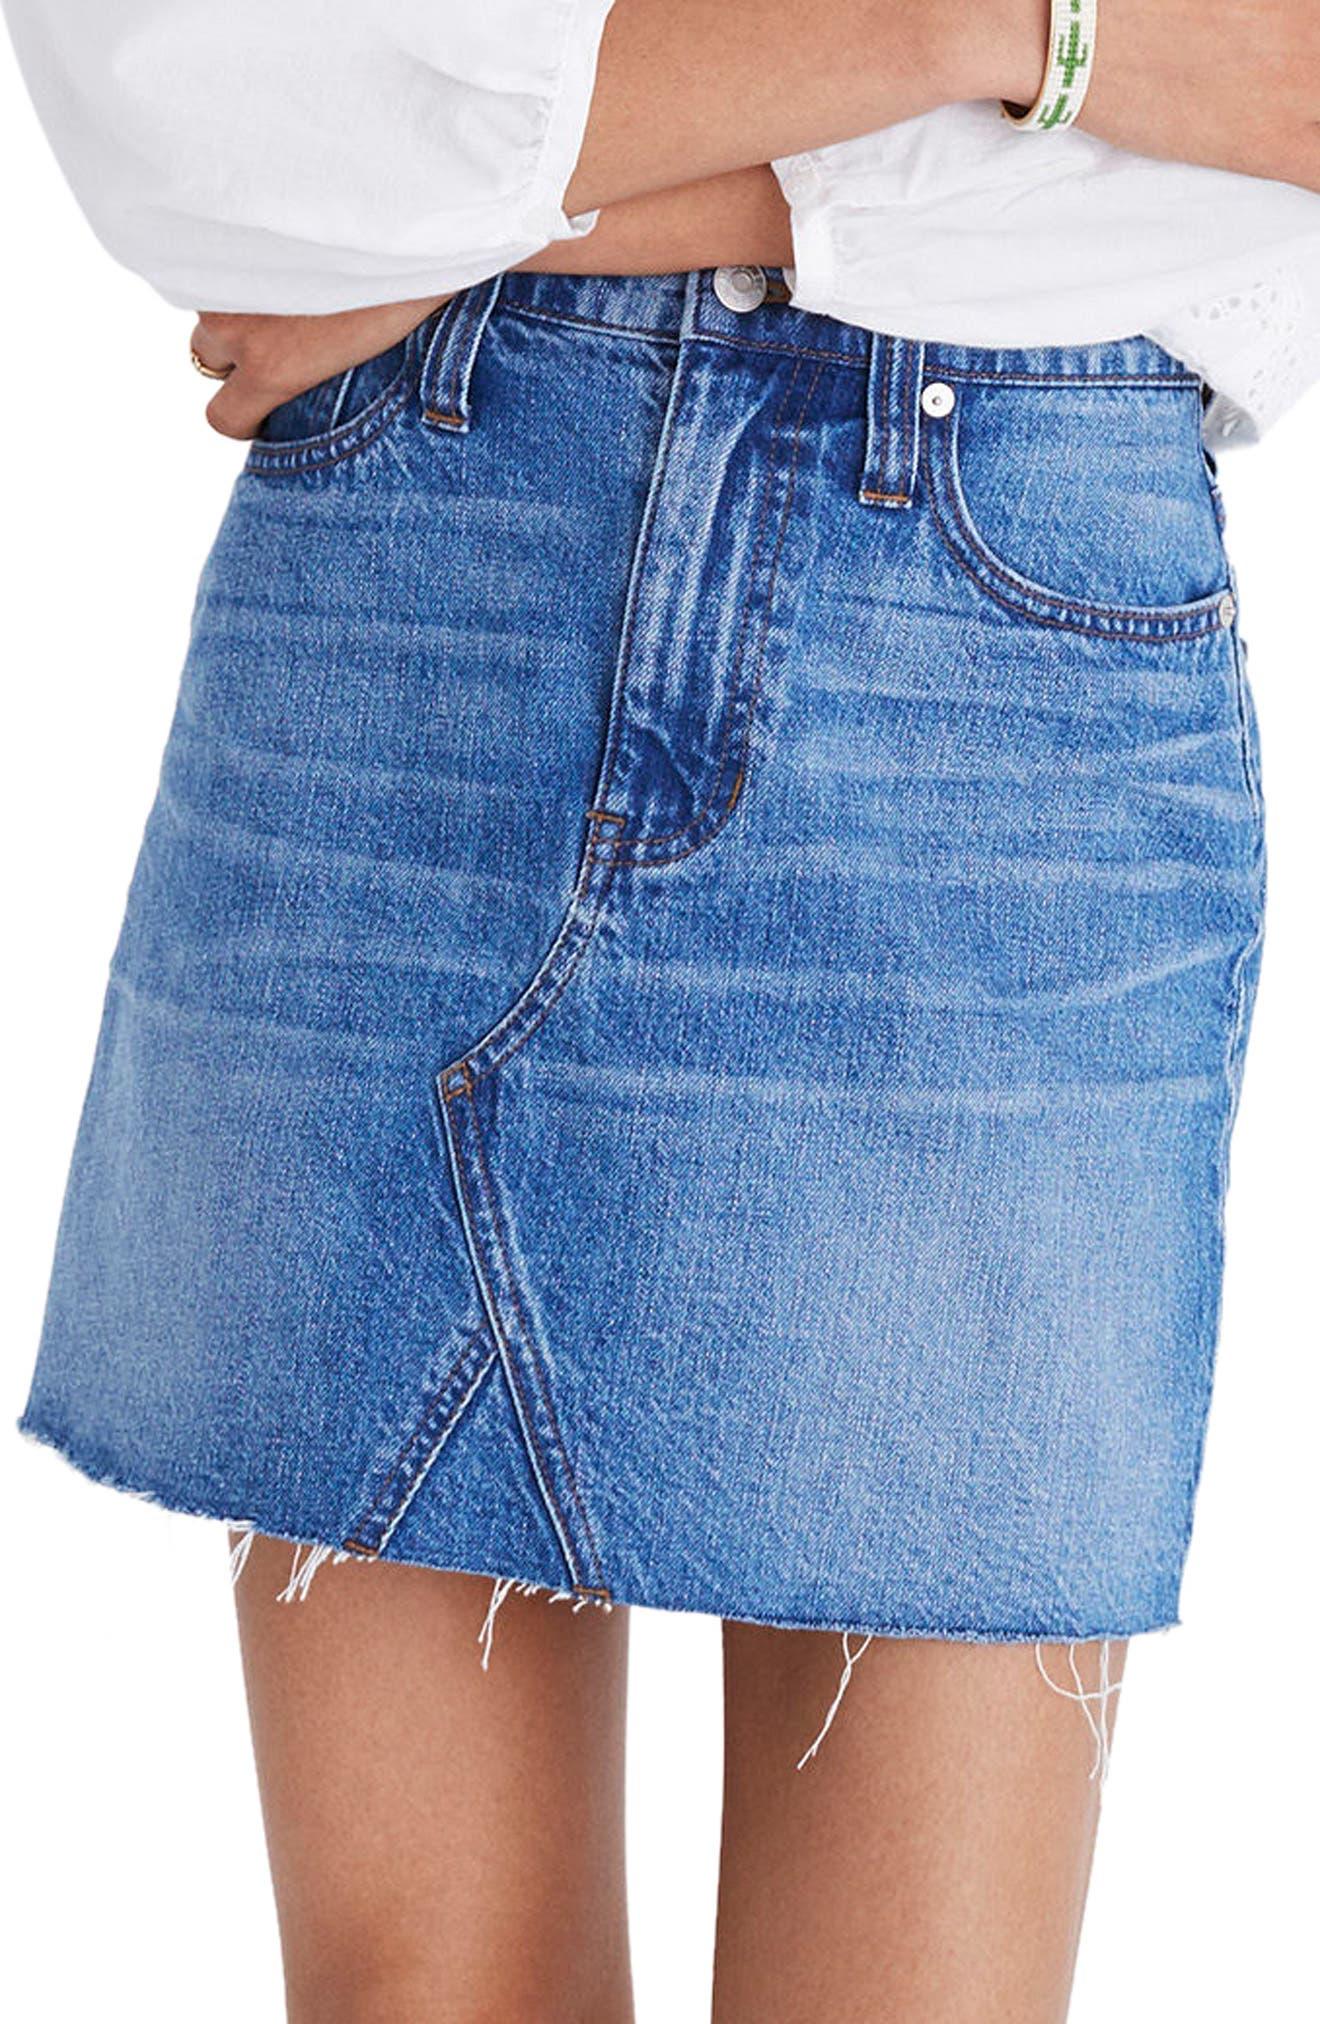 Frisco Denim Miniskirt,                             Main thumbnail 1, color,                             400